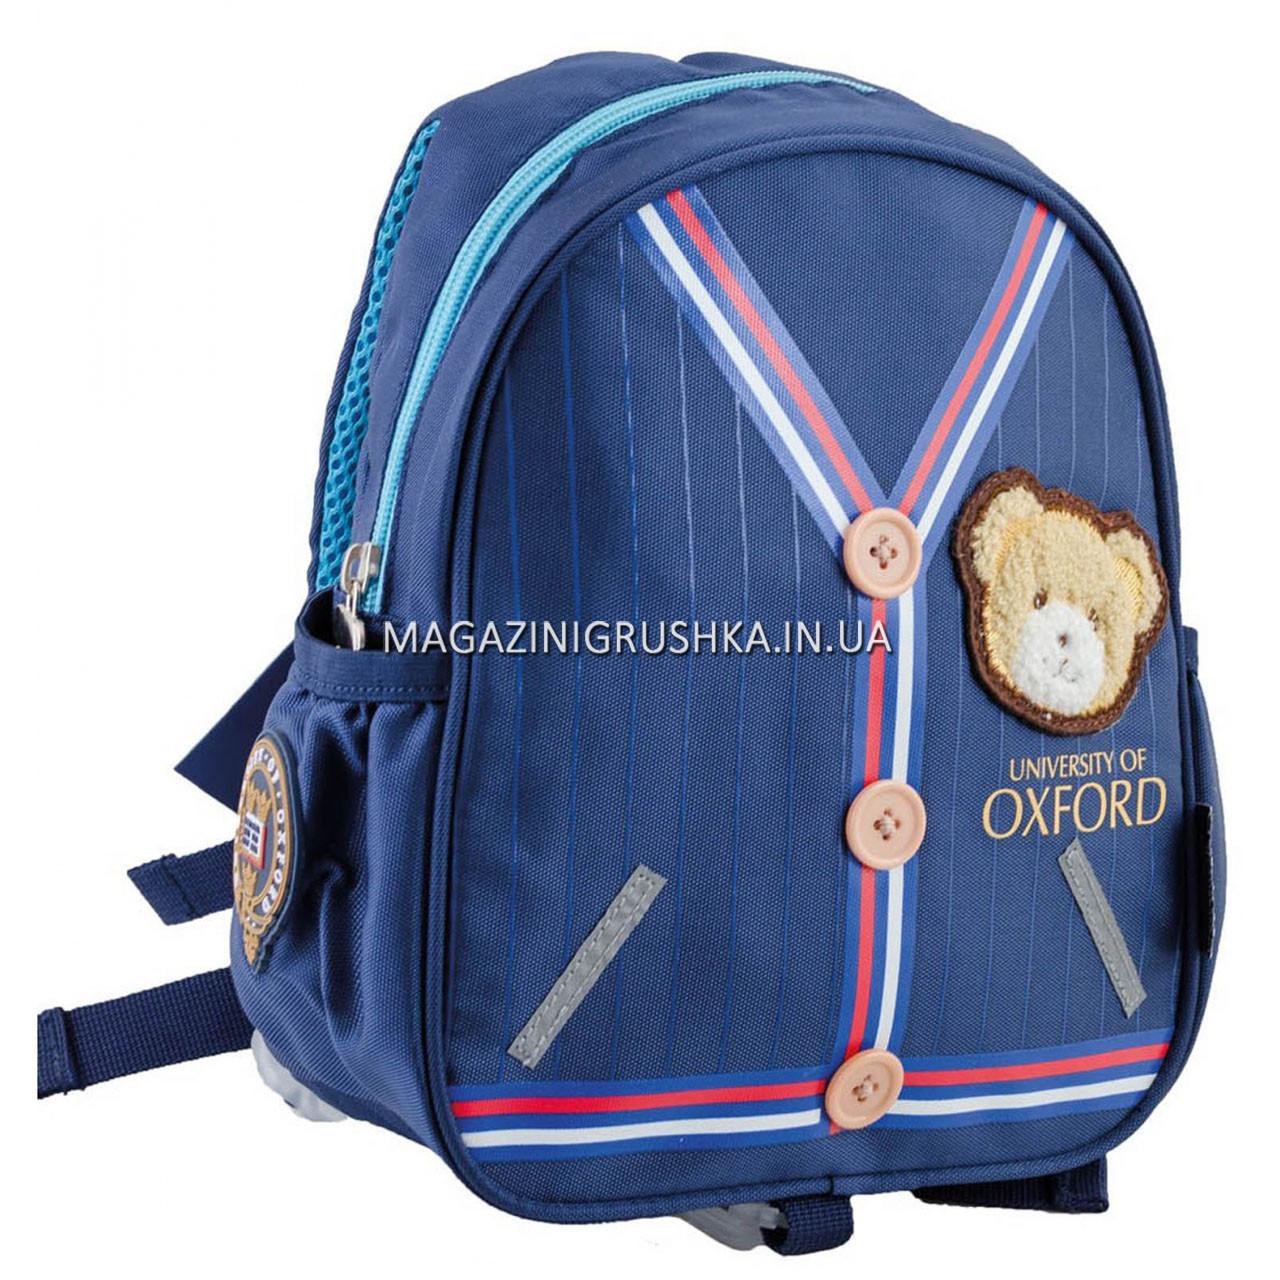 Рюкзак детский YES j025, 20.5*25*9,5